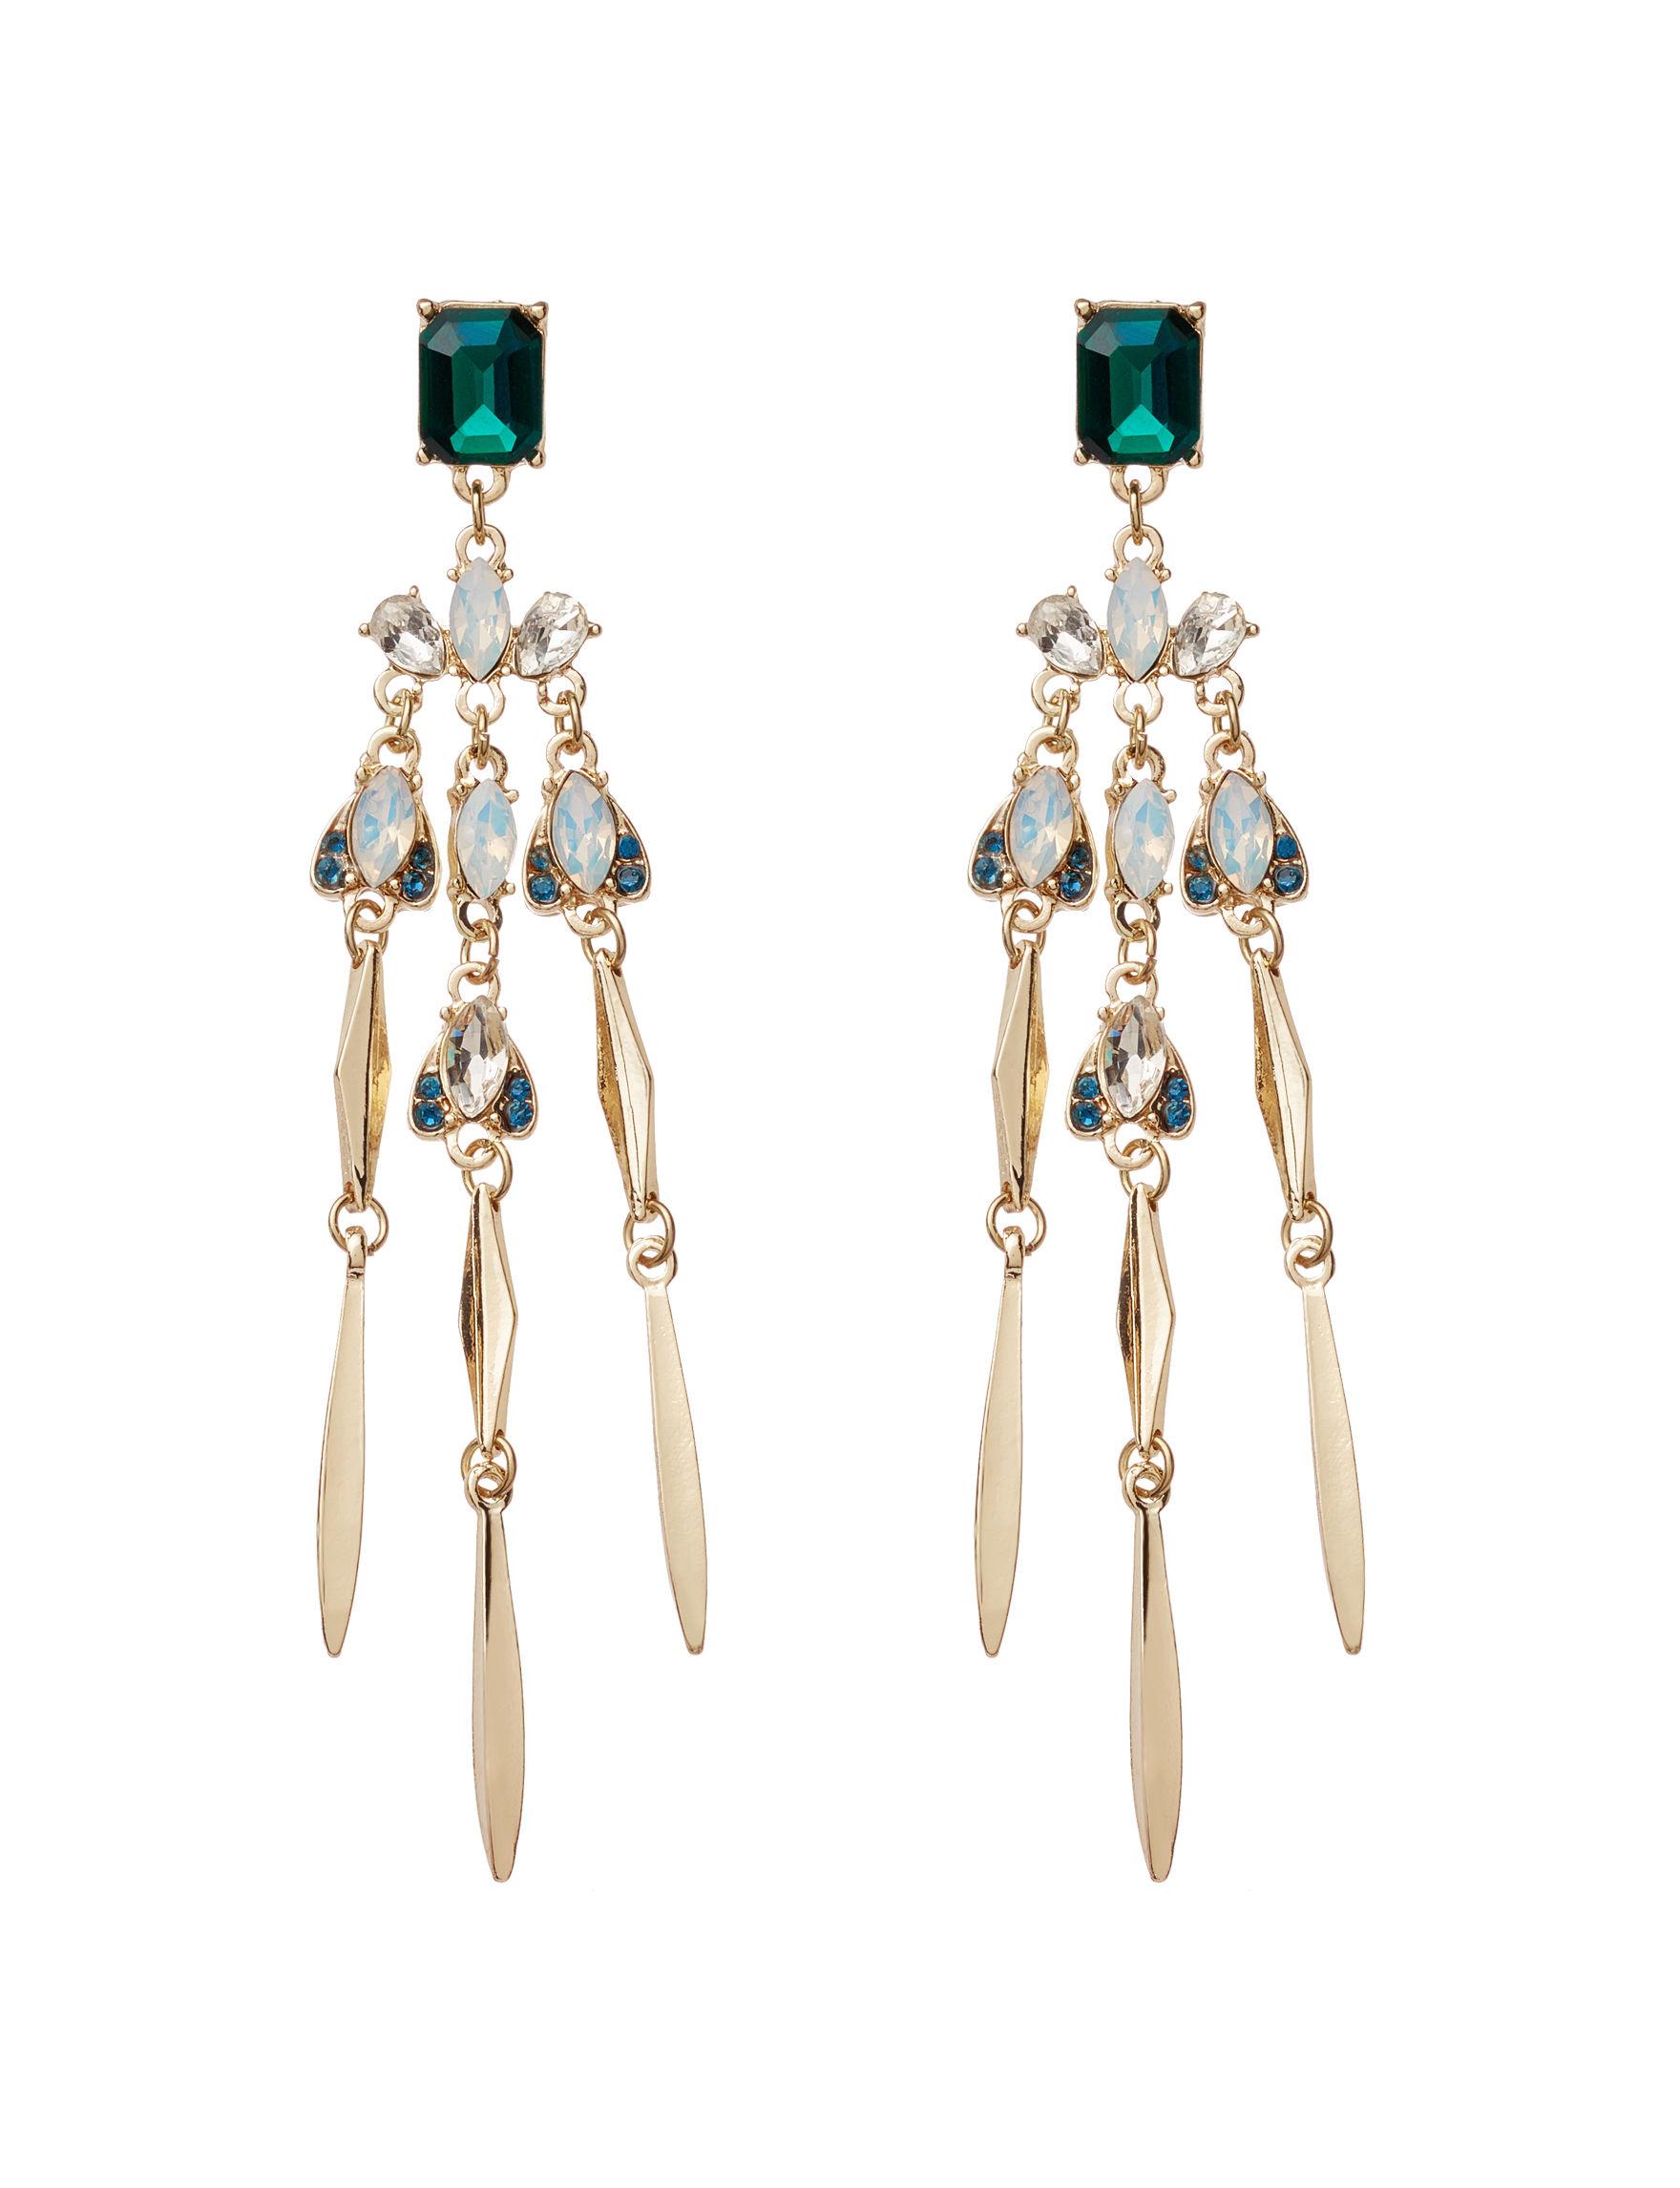 Signature Studio Green Fashion Jewelry